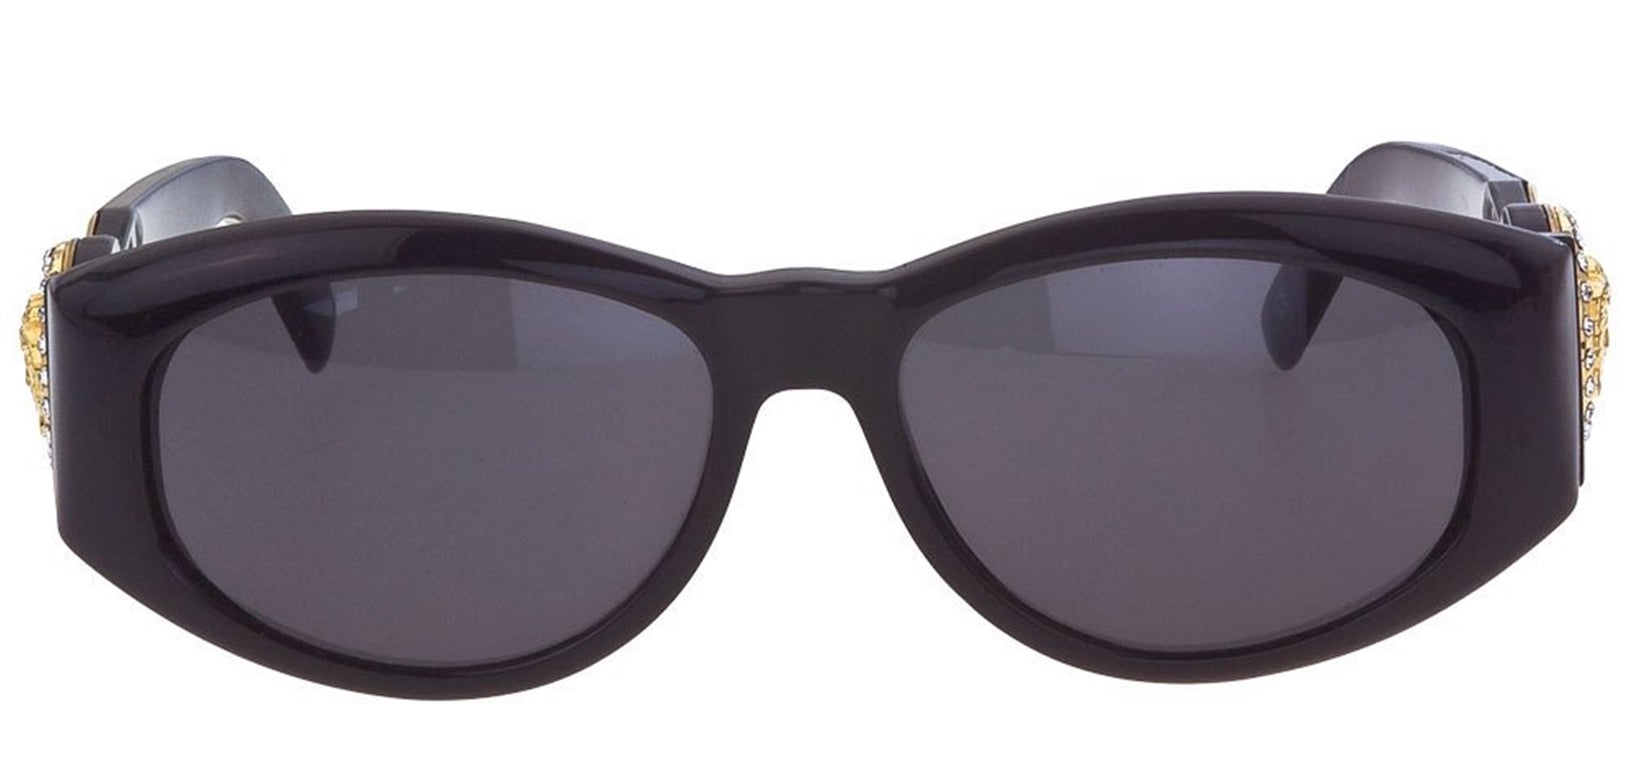 a03031cb38bf Versace Vintage Black MOD 424 Sunglasses with Rhinestones at 1stdibs